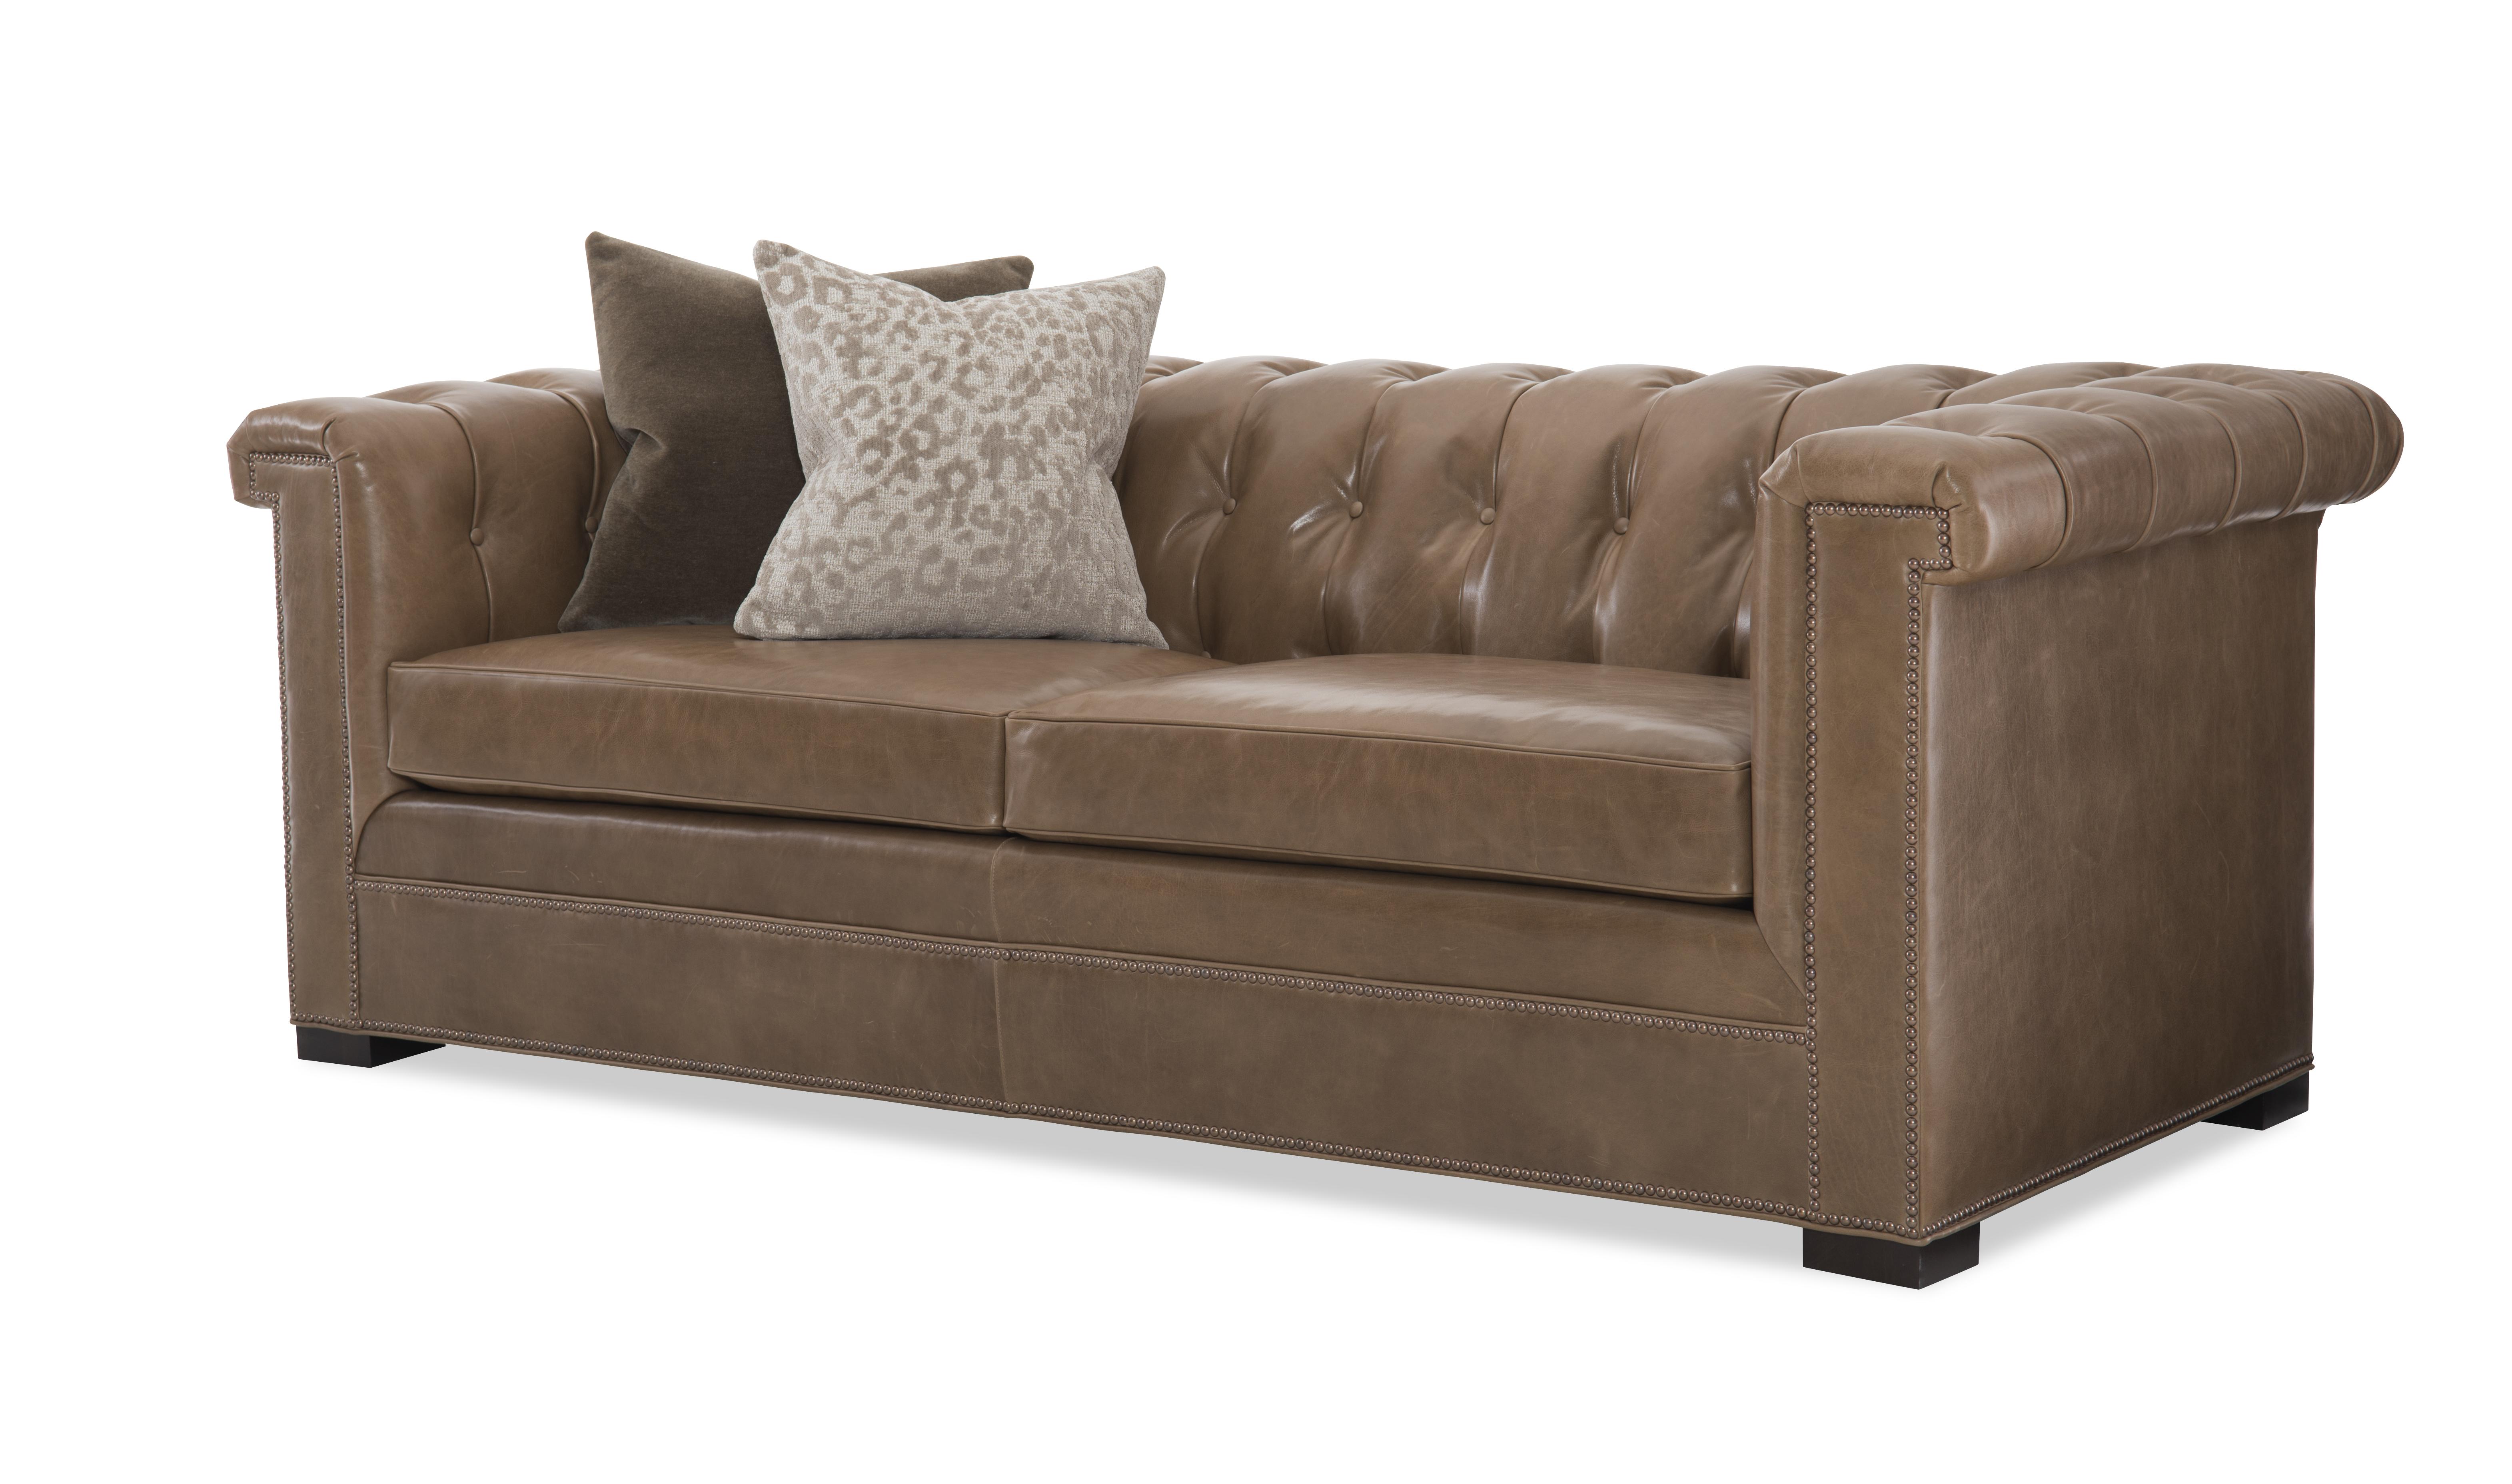 Wesley Hall McGee sofa